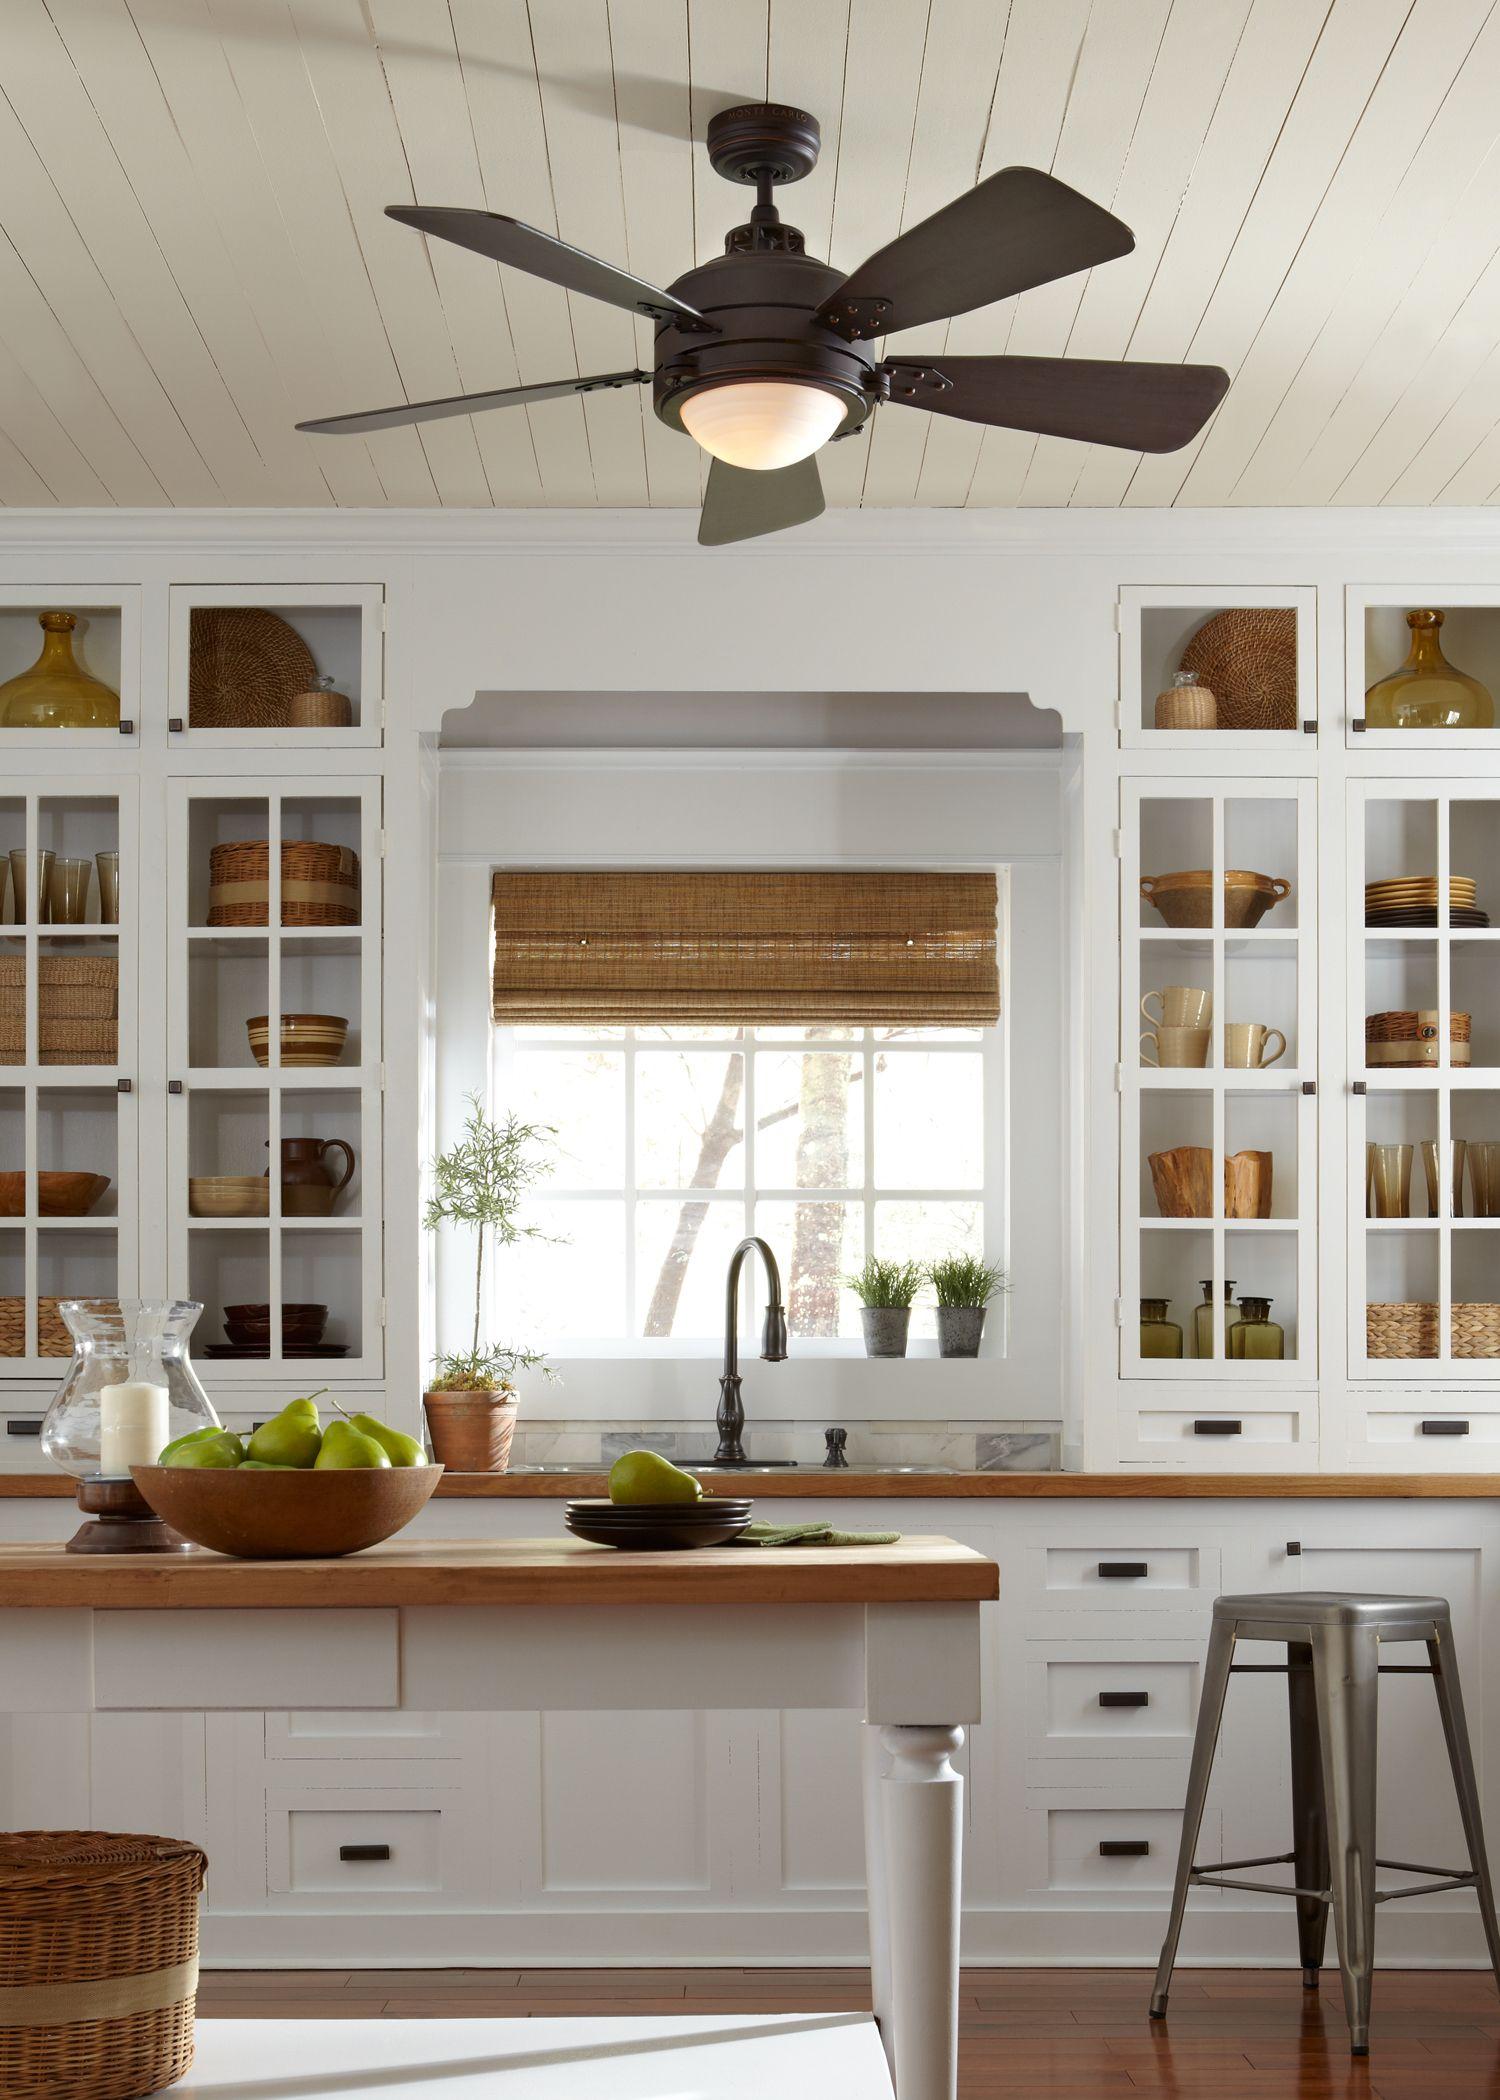 exhaust fan for kitchen ceiling moen anabelle faucet have a vintage industrial décor the 52 quot